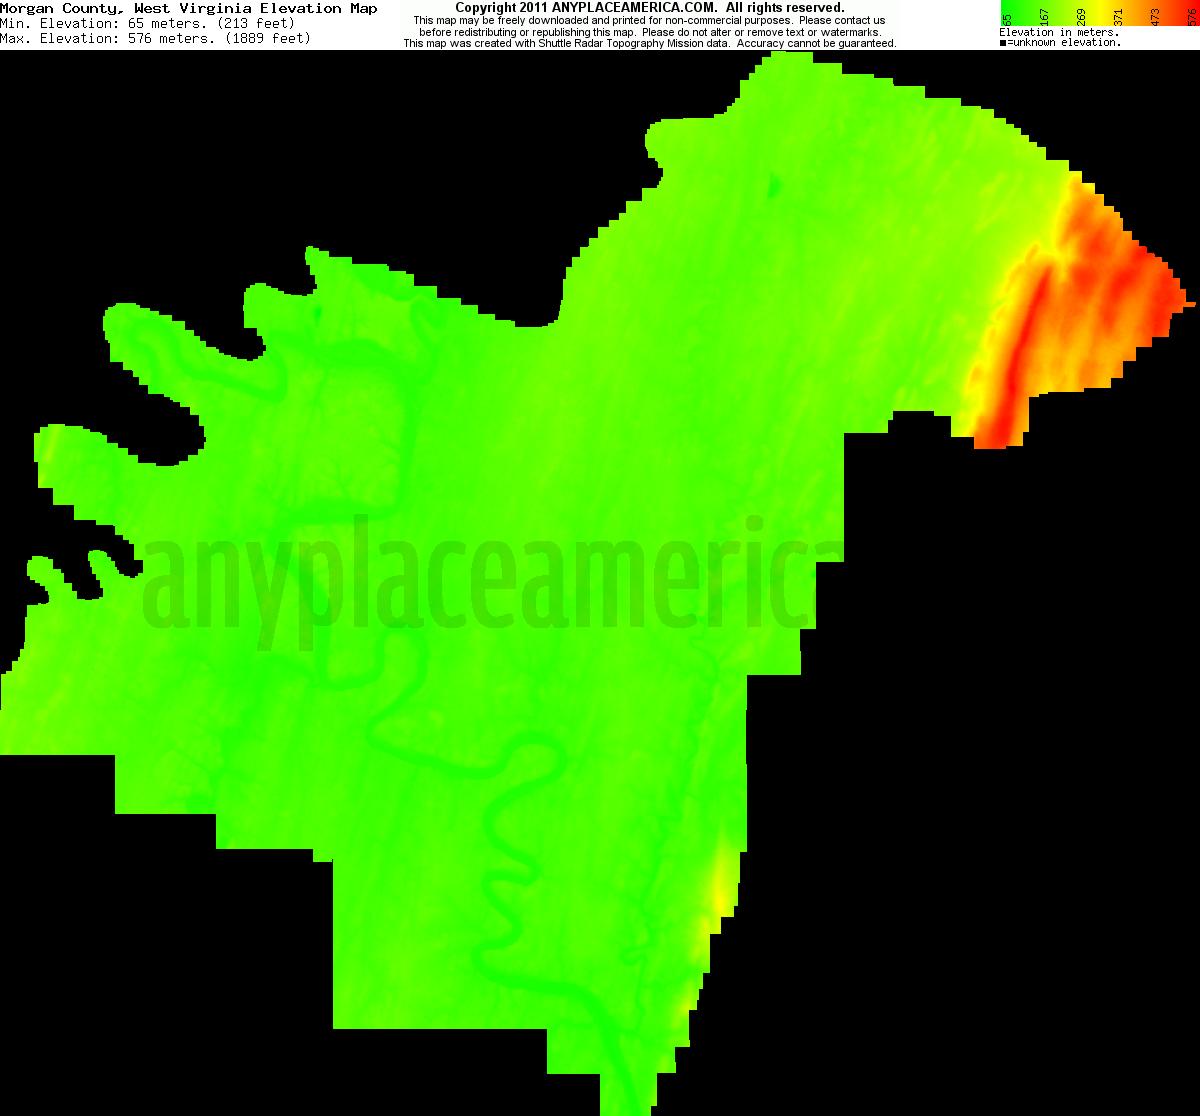 Free Morgan County, West Virginia Topo Maps & Elevations